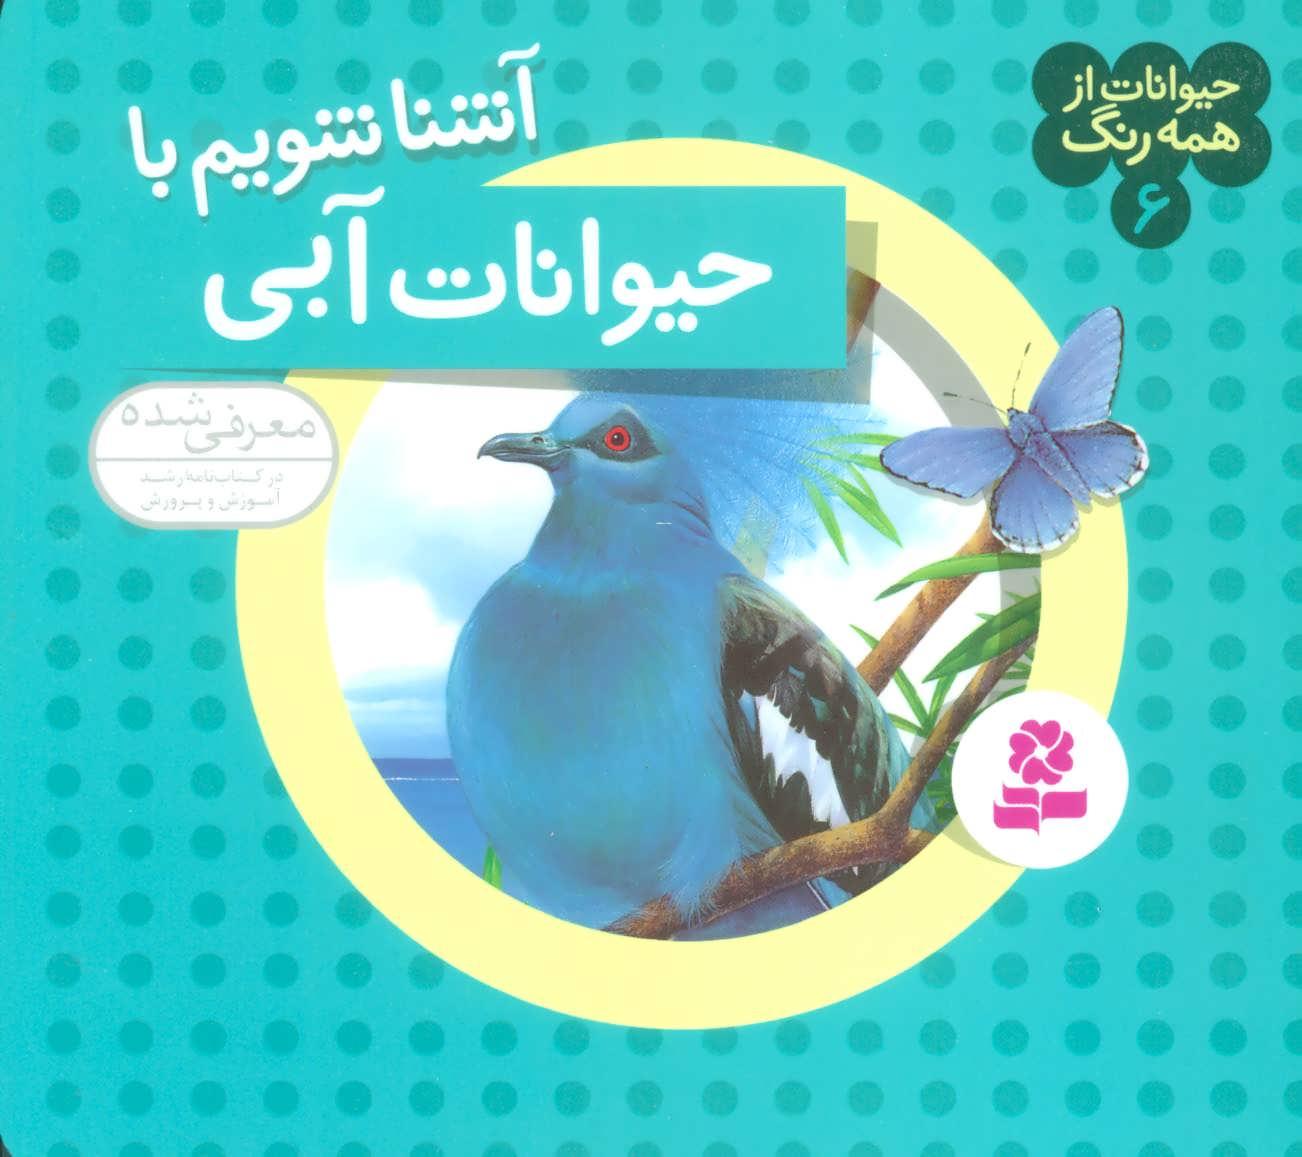 کتاب آشنا شویم با حیوانات آبی